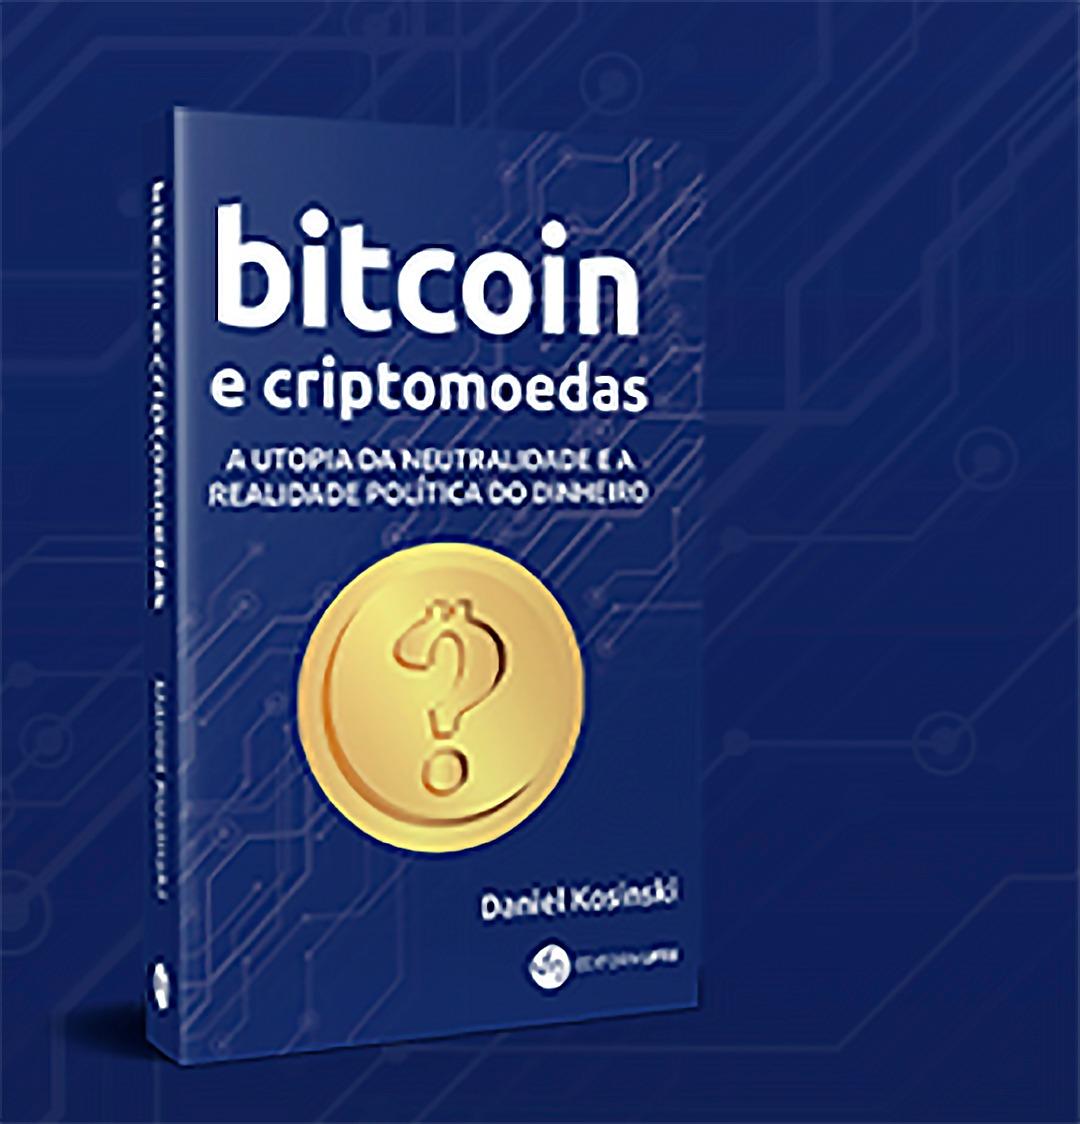 Editora UFRJ lança Bitcoin e criptomoedas, de Daniel Kosinski